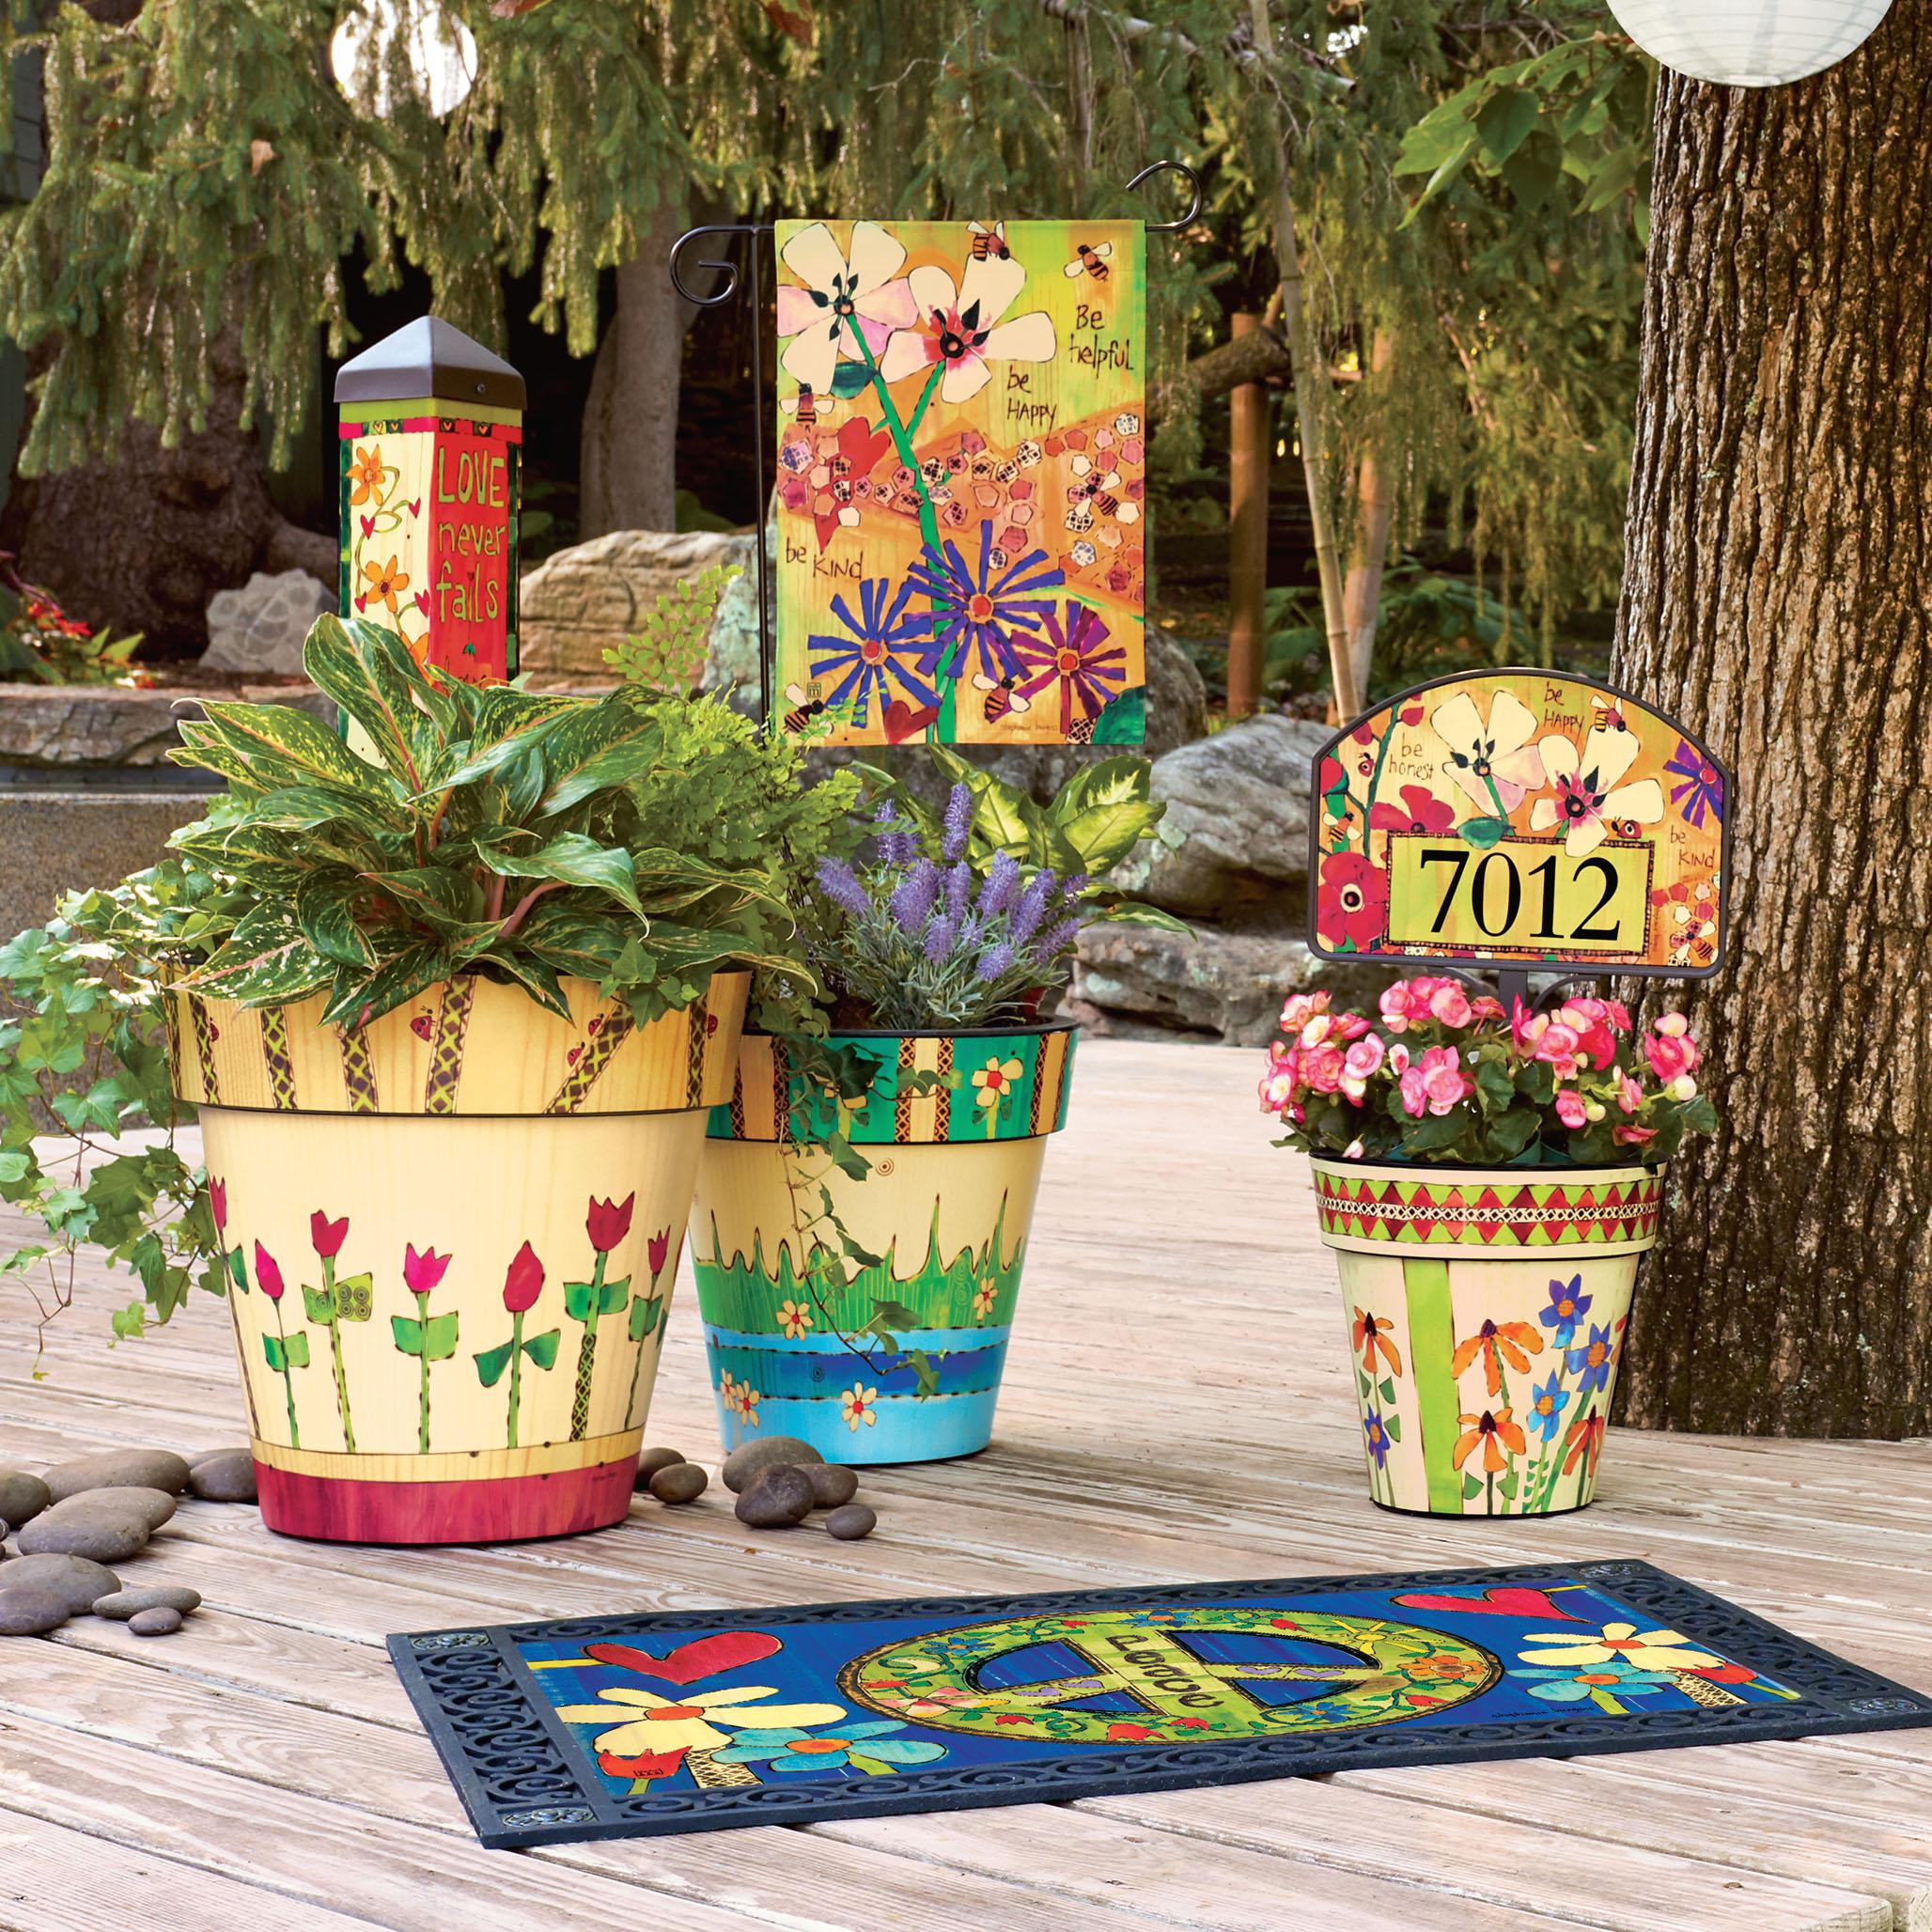 NEW Designs! on easter yard designs, yard sign designs, beautiful yard designs, magnet works yard signs, artistic yard designs, christmas yard designs, home yard designs, yard art designs, magnetic yard designs,